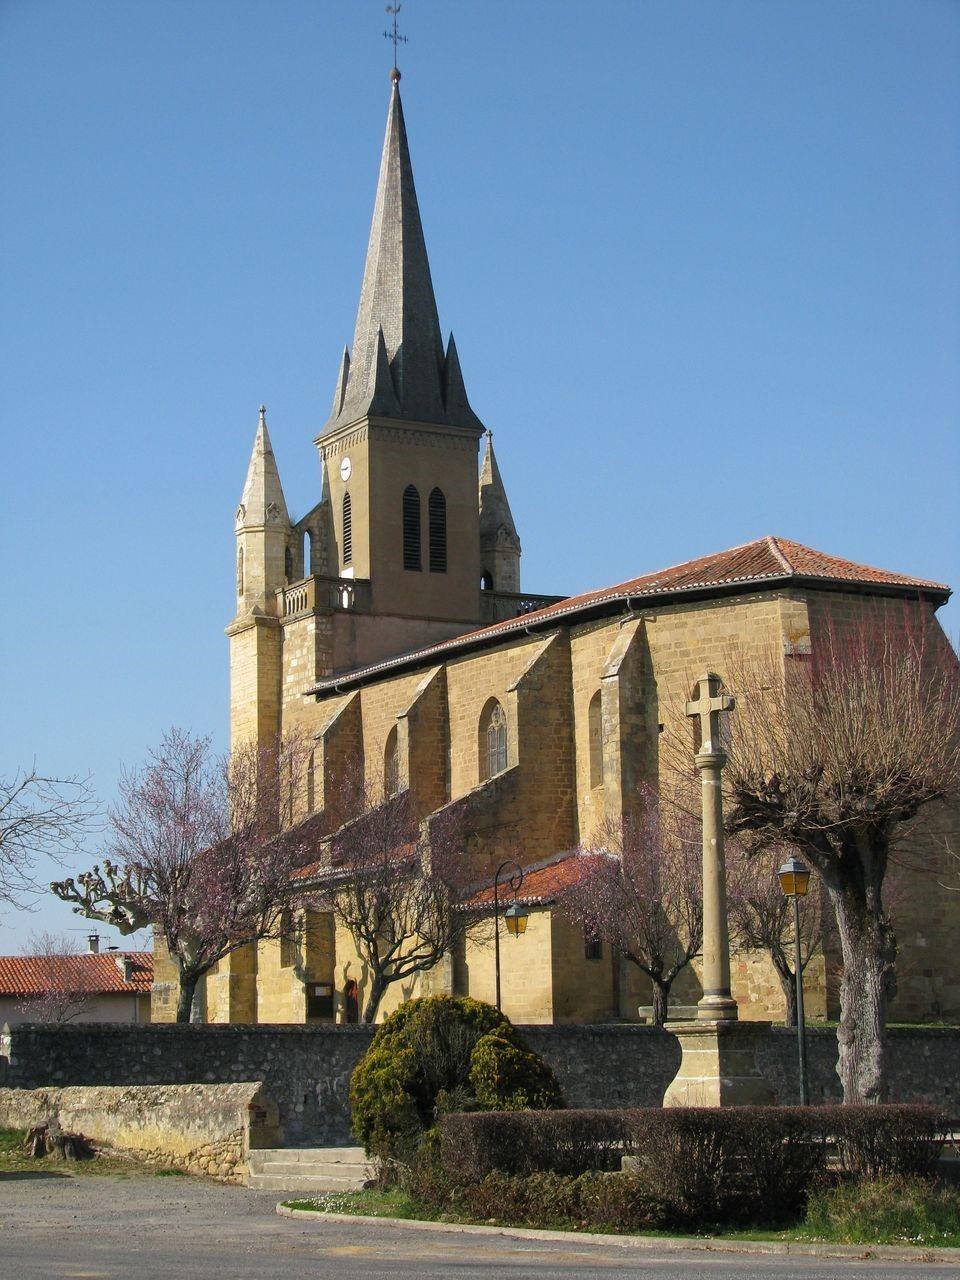 Eglise Saint-Julien-de-Brioude Galan